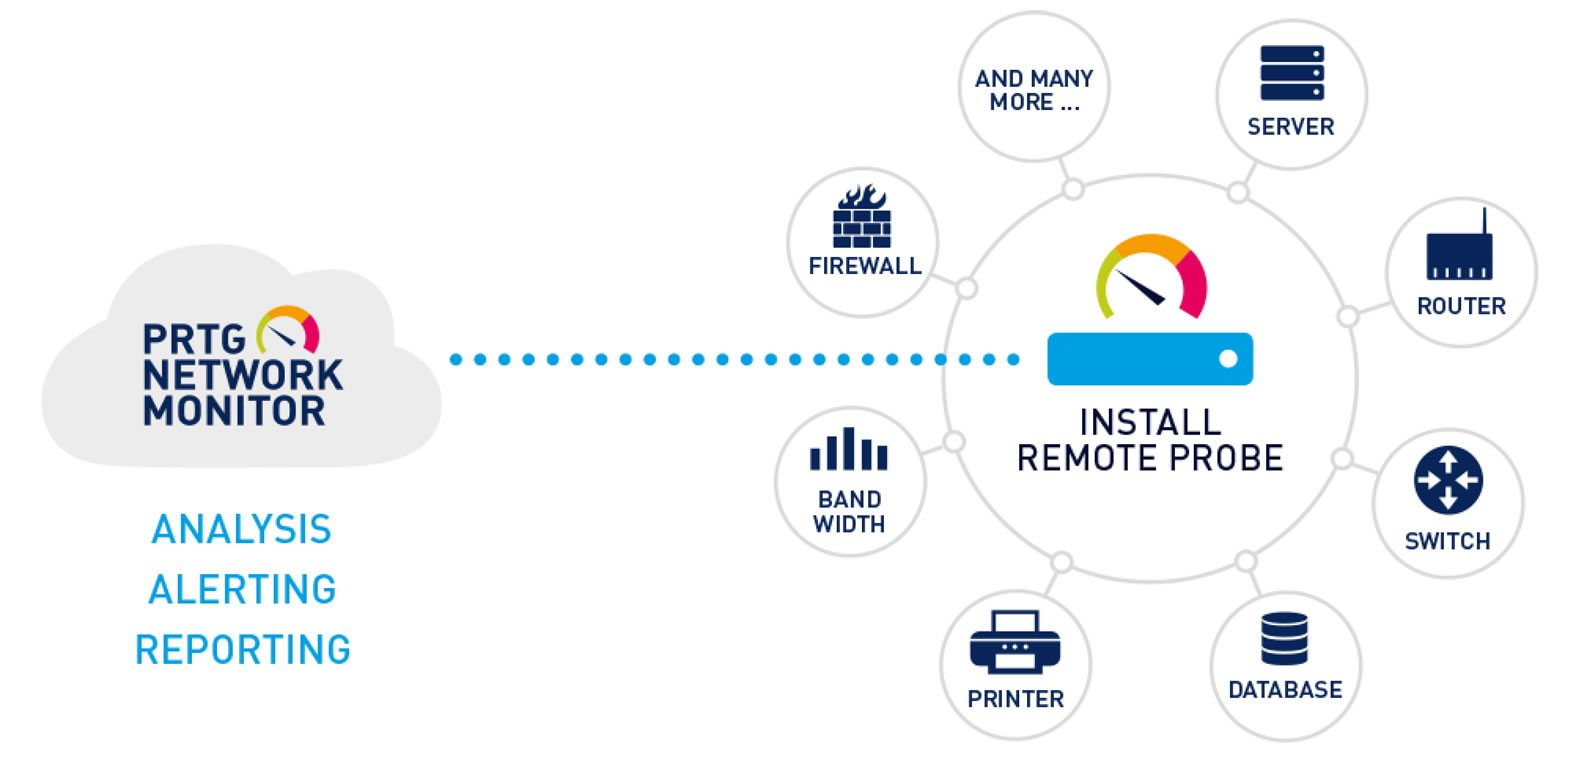 PRTG Network Monitor | Terra Nova Team